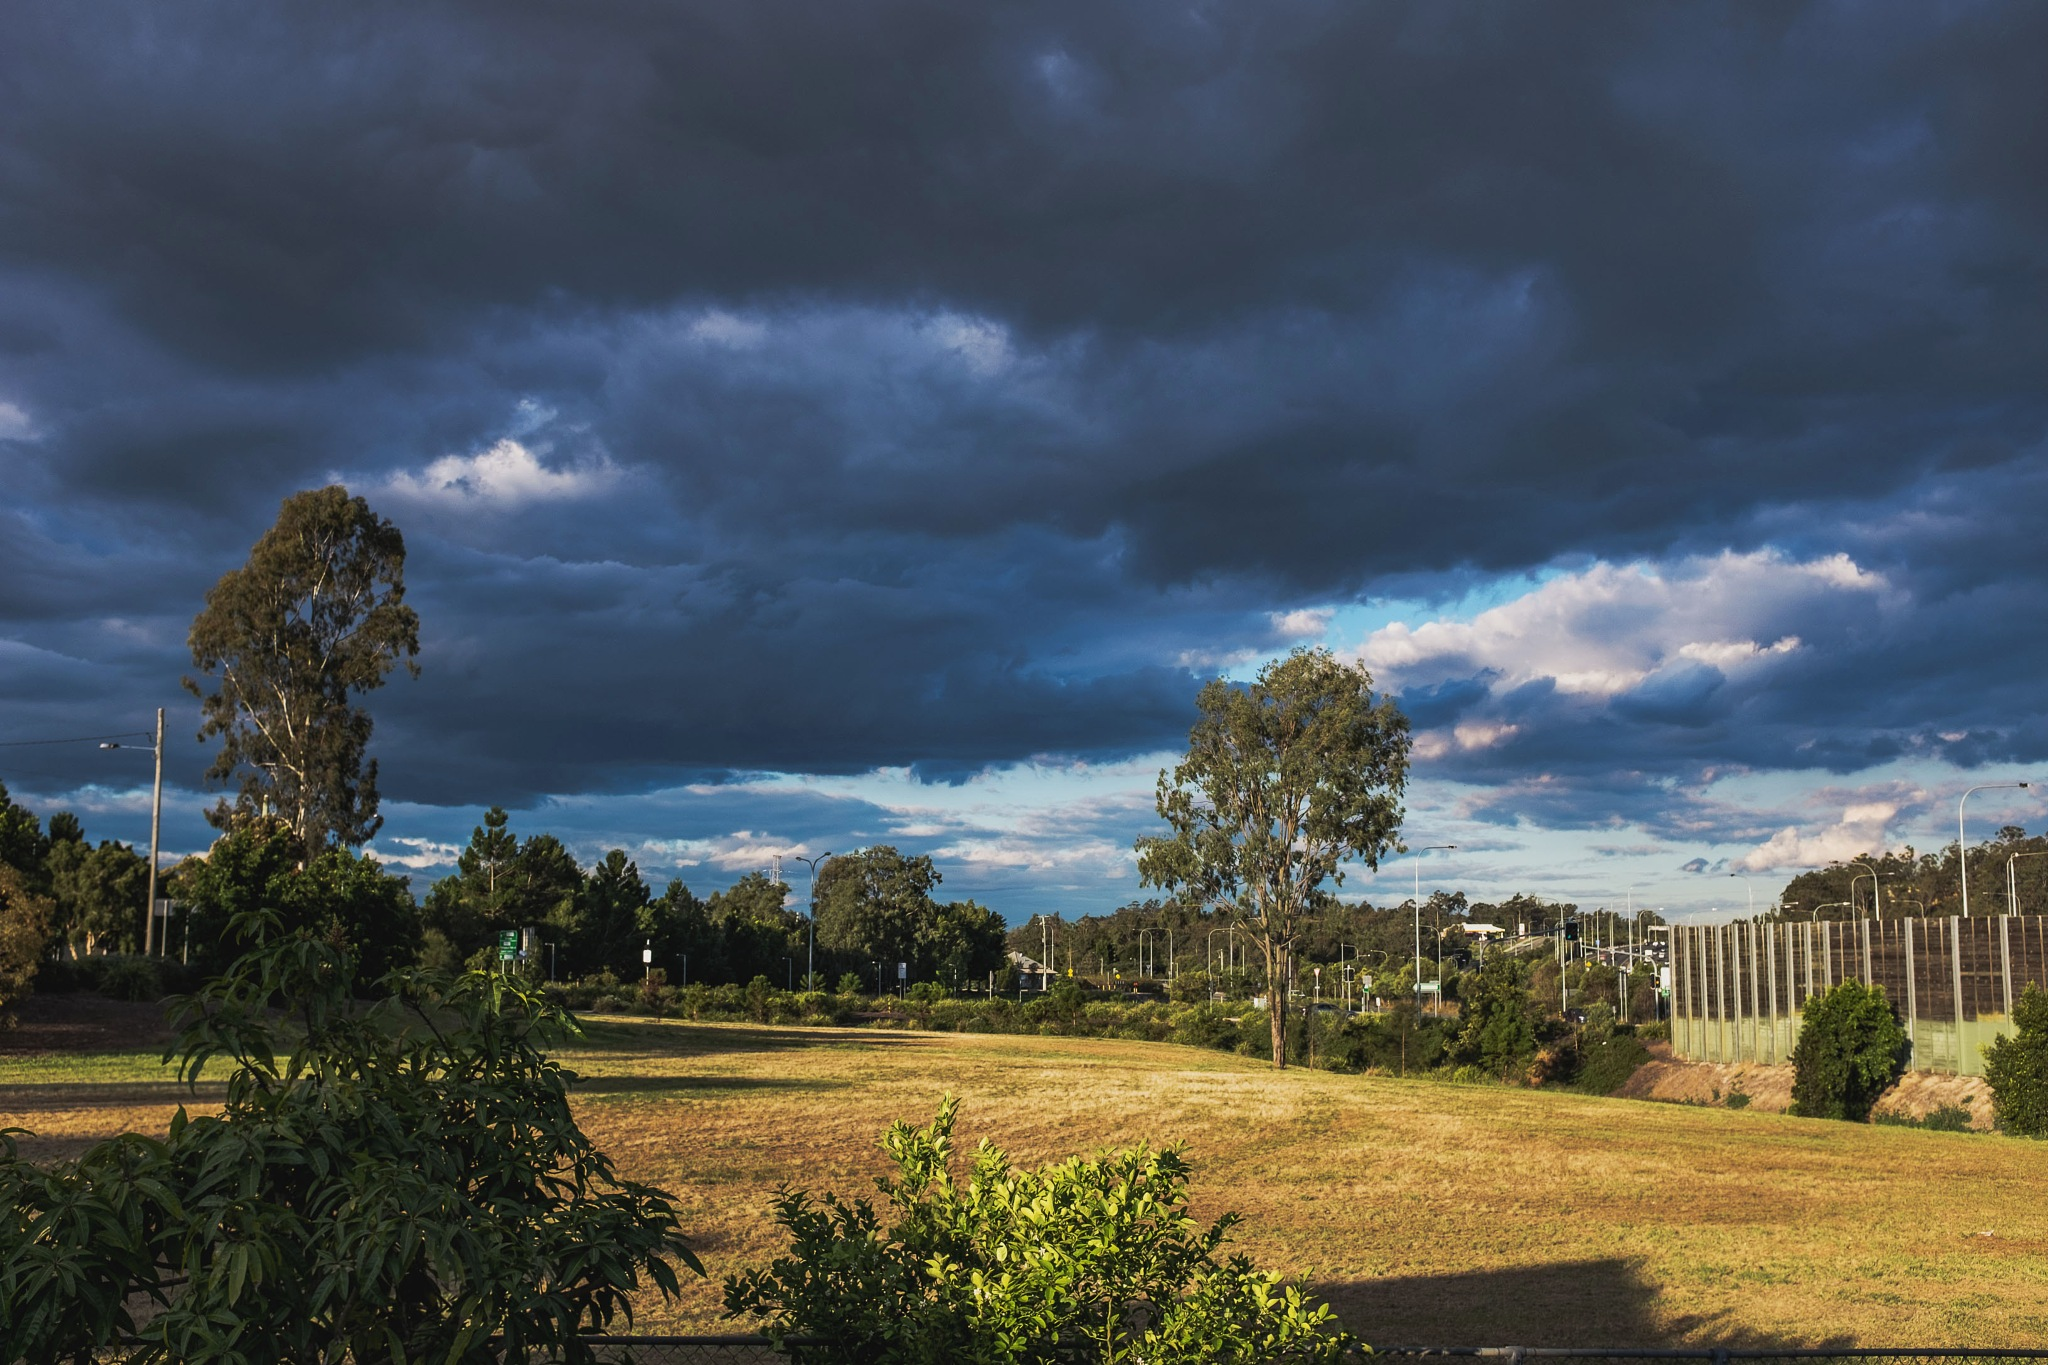 Storm Clouds, No Rain. by ensbassatt